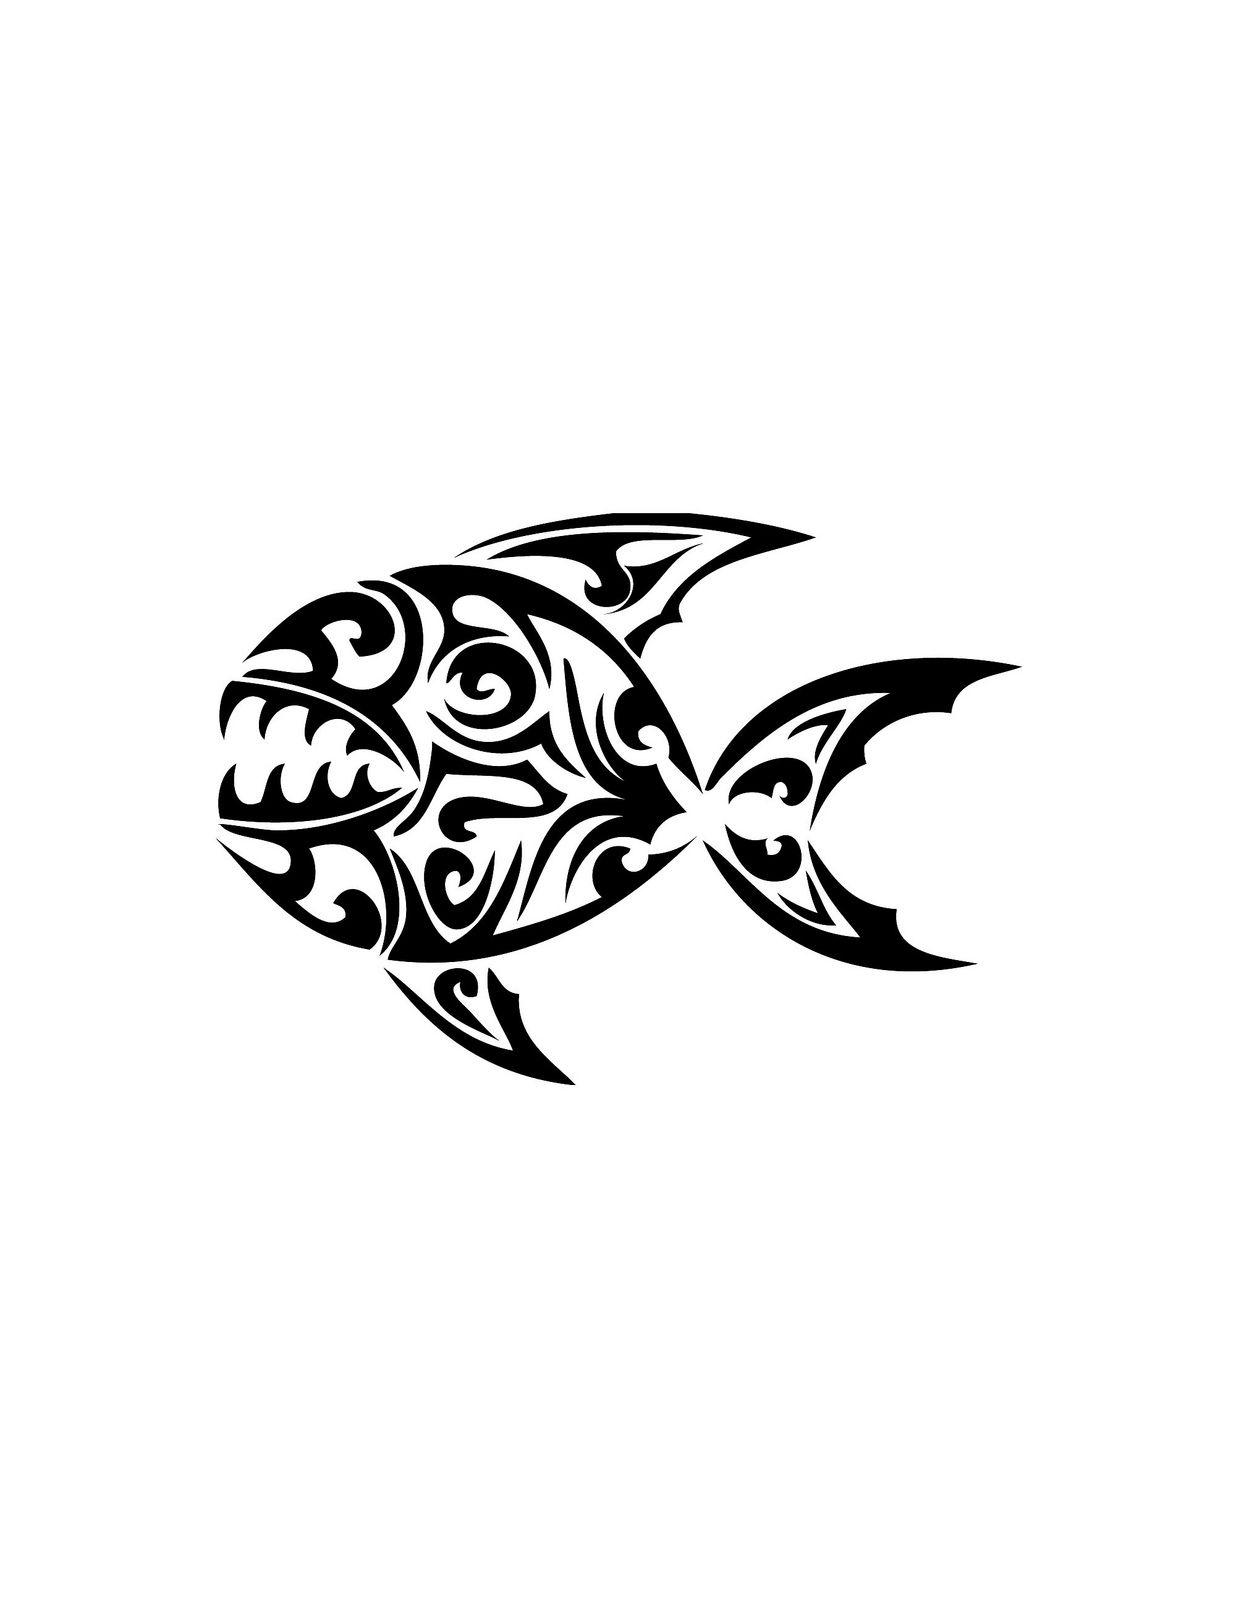 Tribal koi fish tattoo meaning koi fish tattoo meaning for for Black koi fish meaning